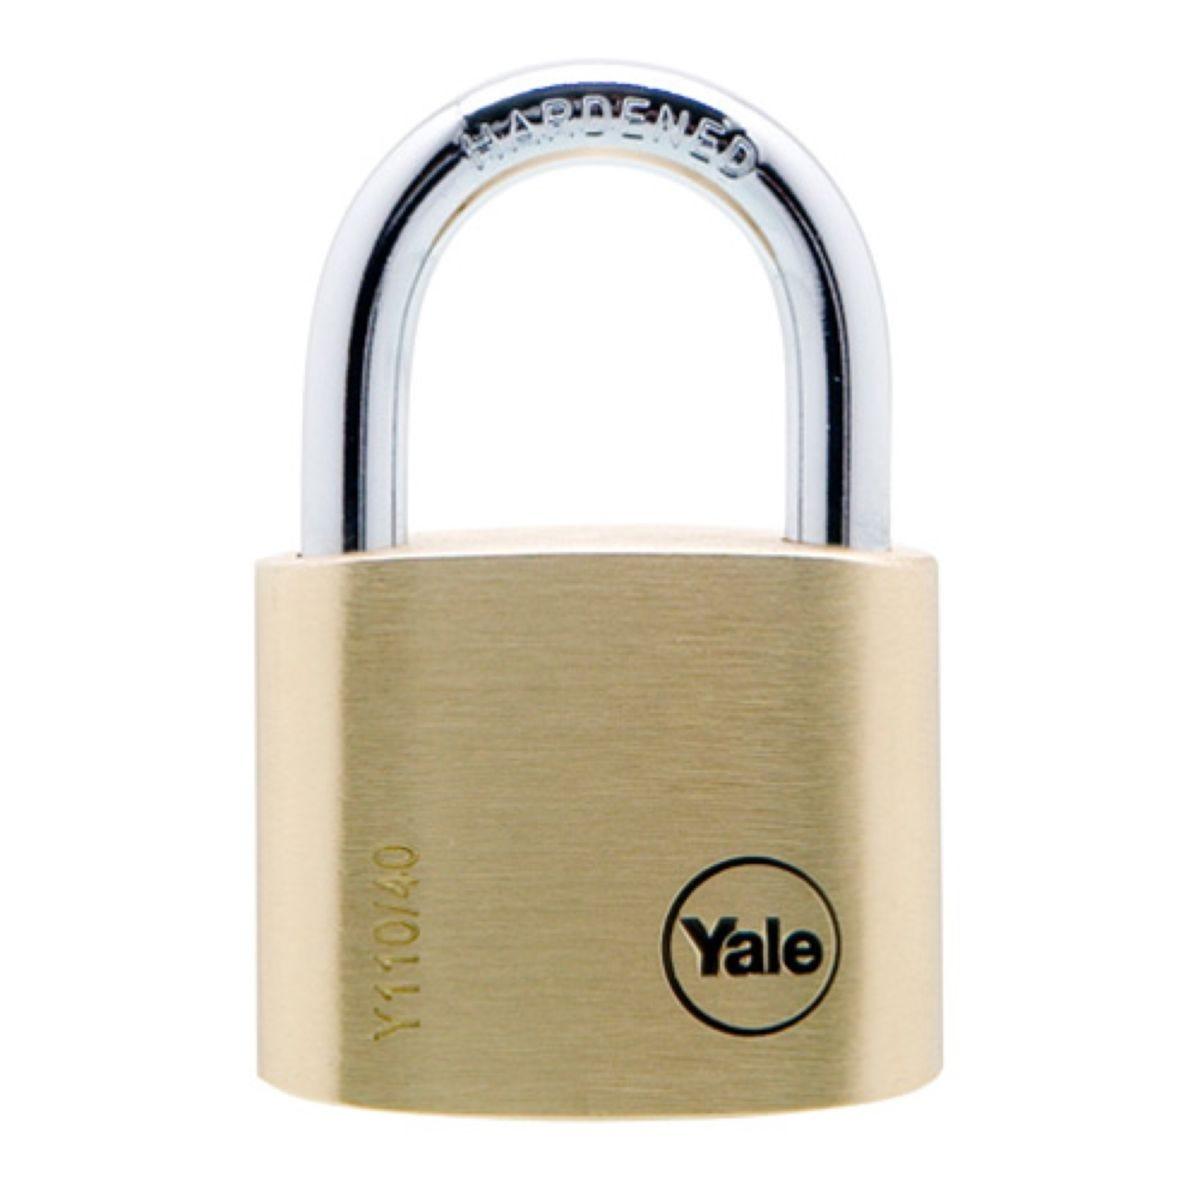 Yale 40mm Brass Padlocks – Pack of 2